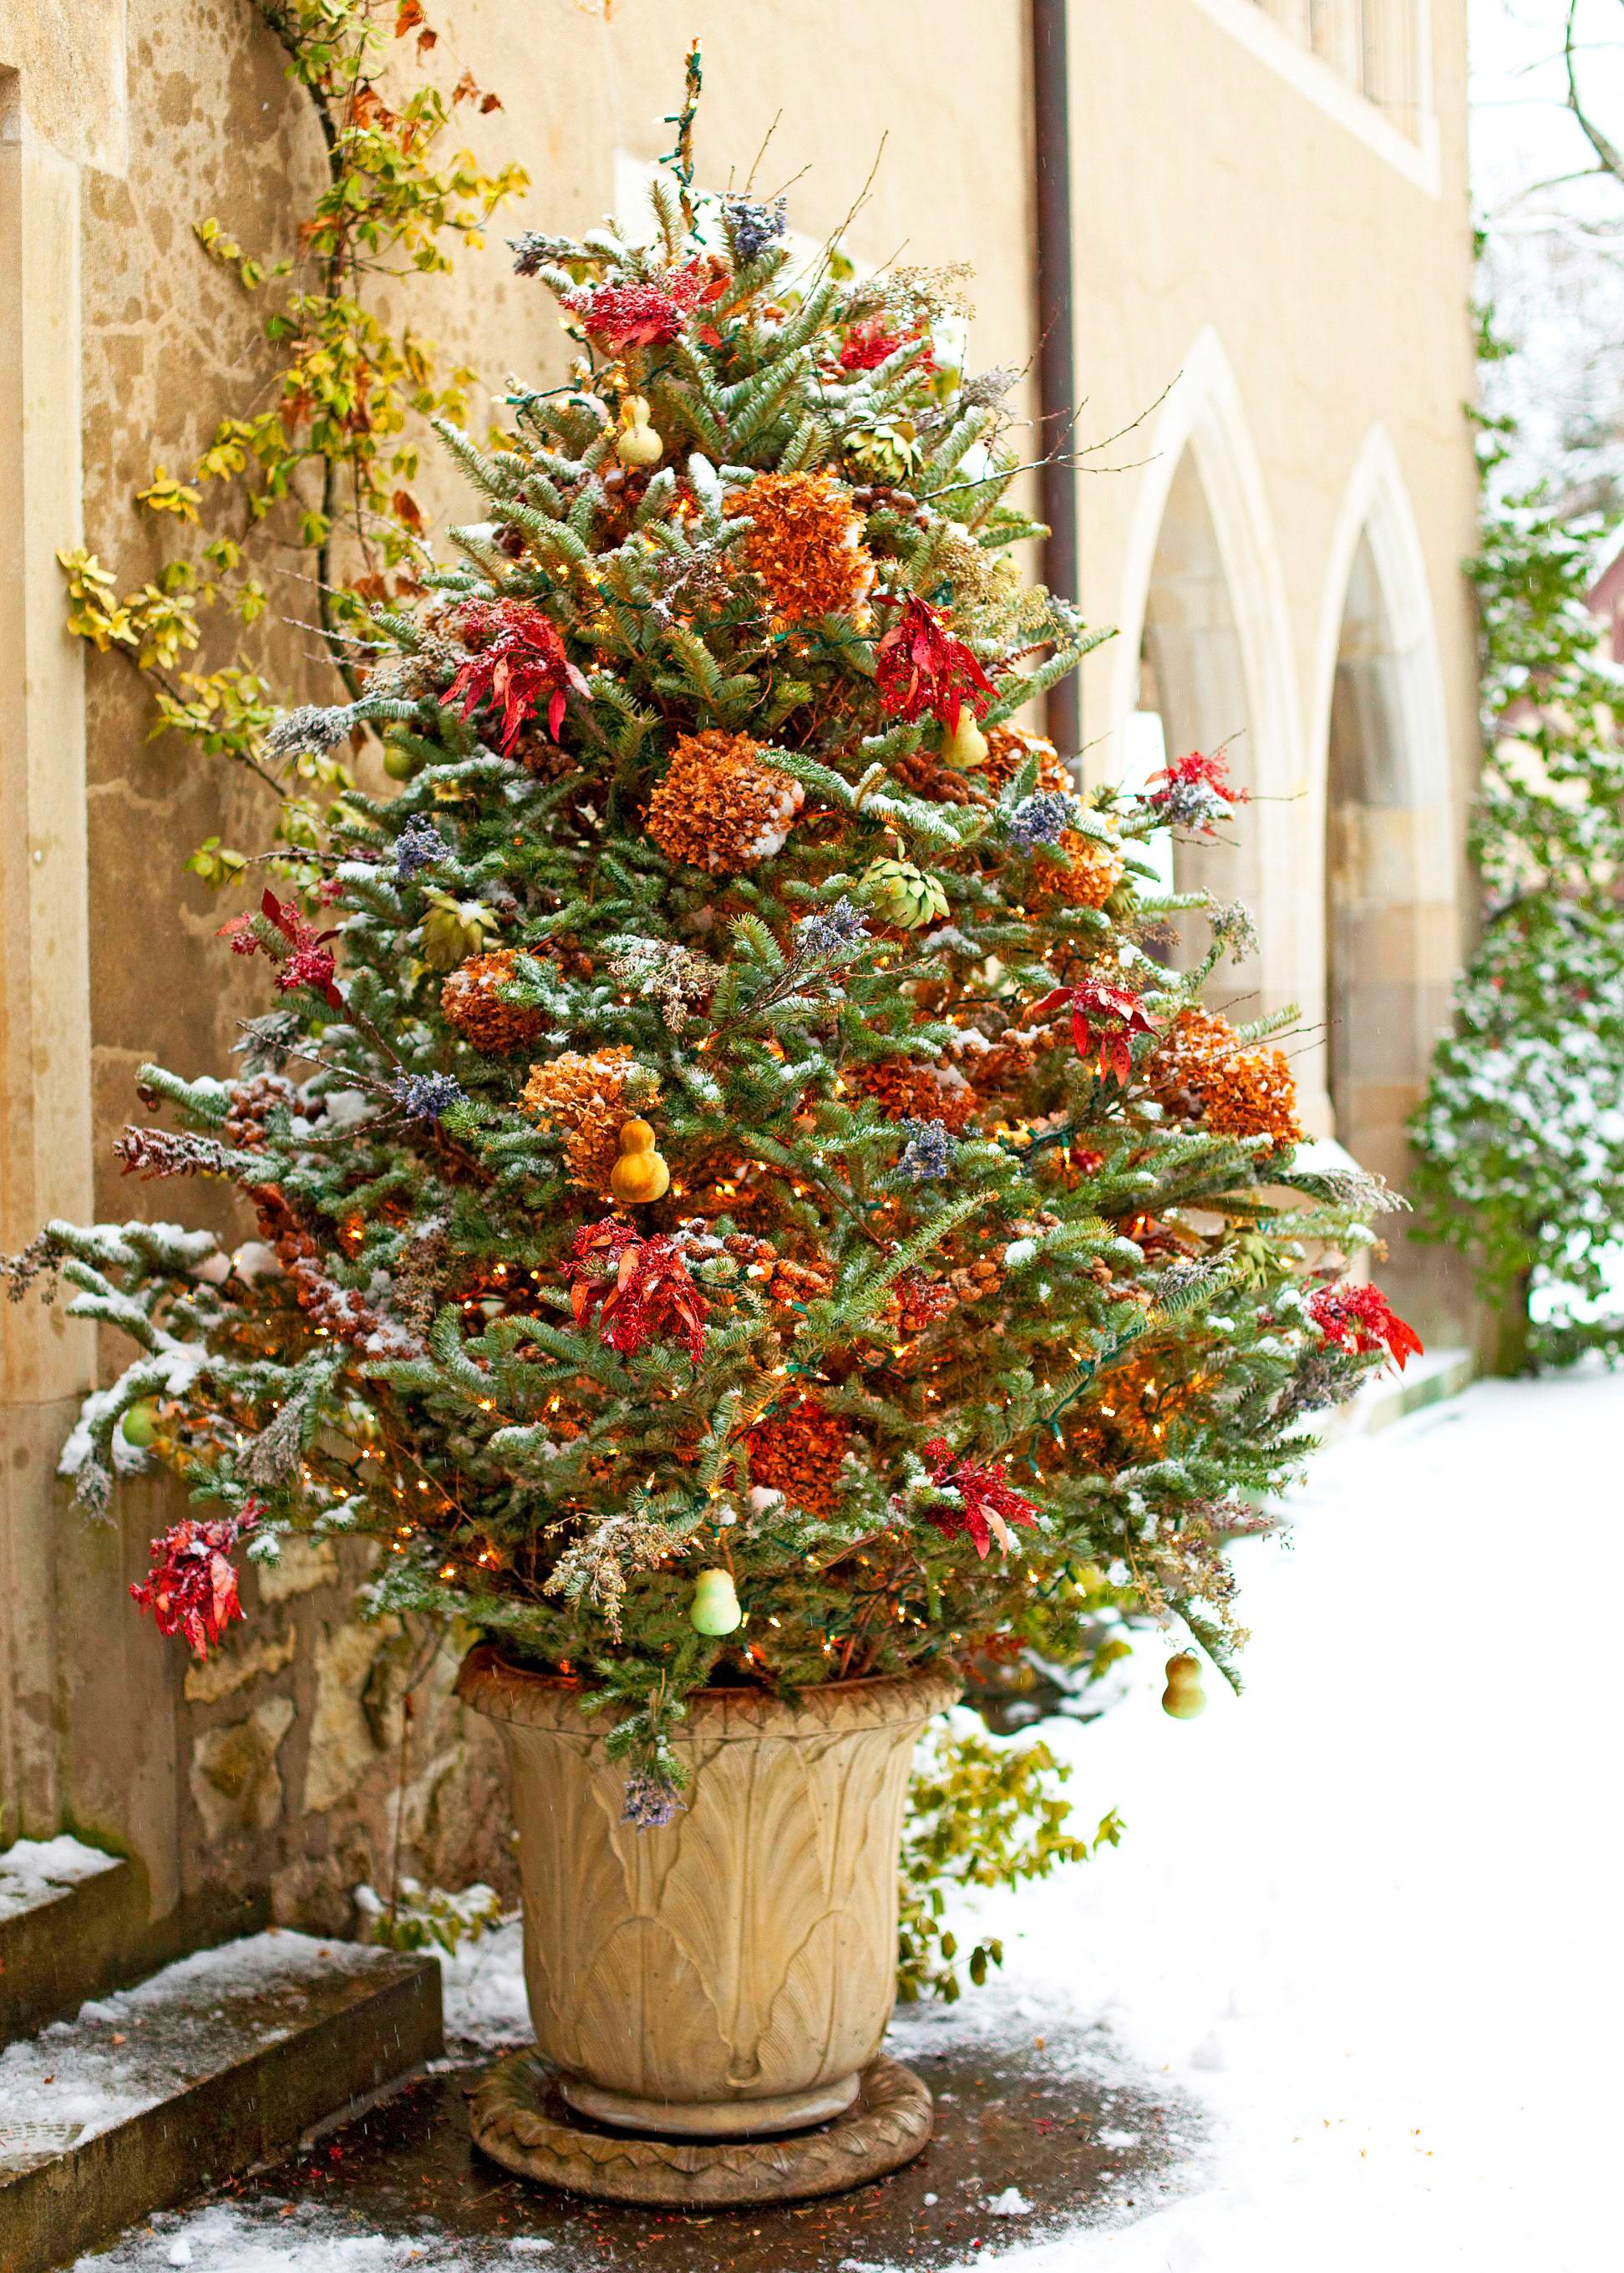 Festive evergreen